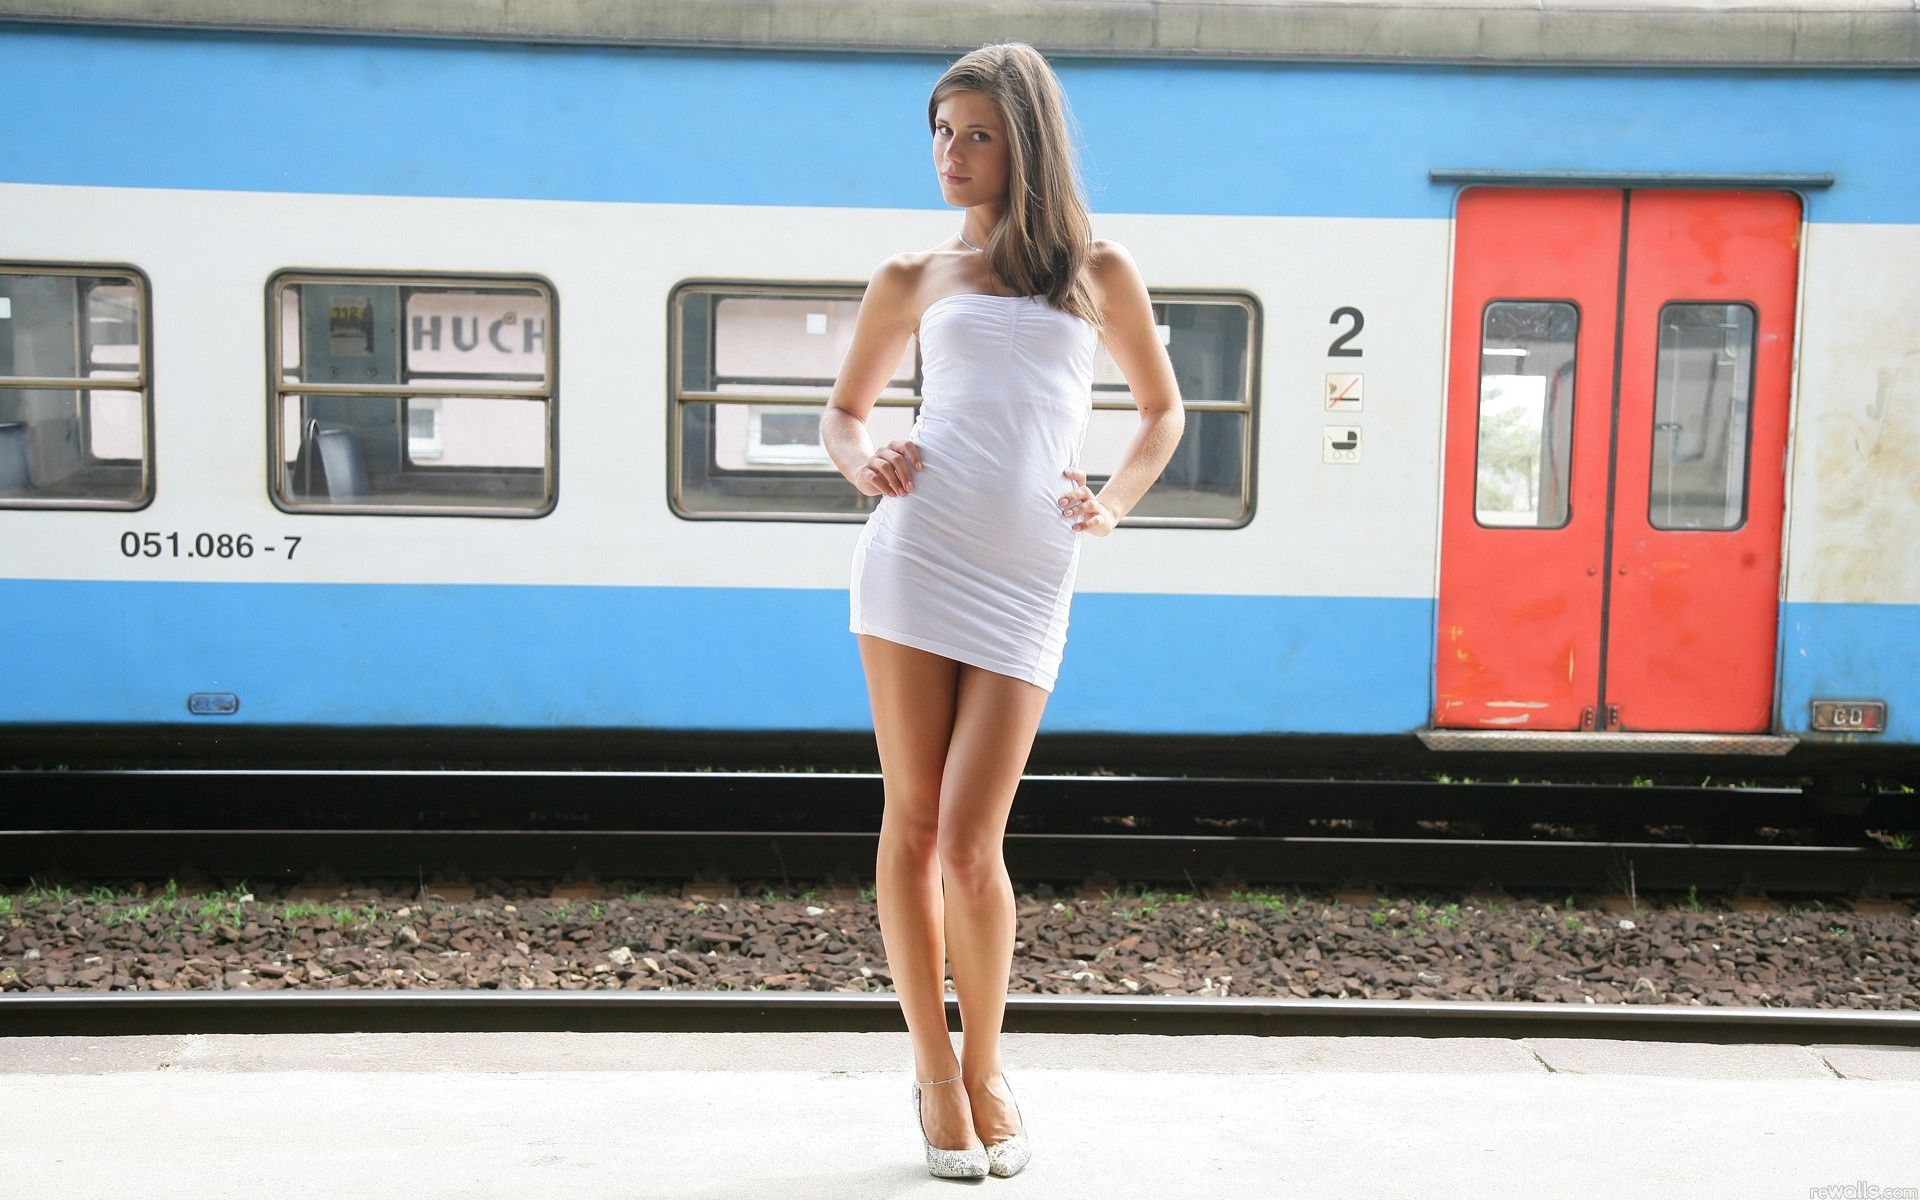 caprice A praha train